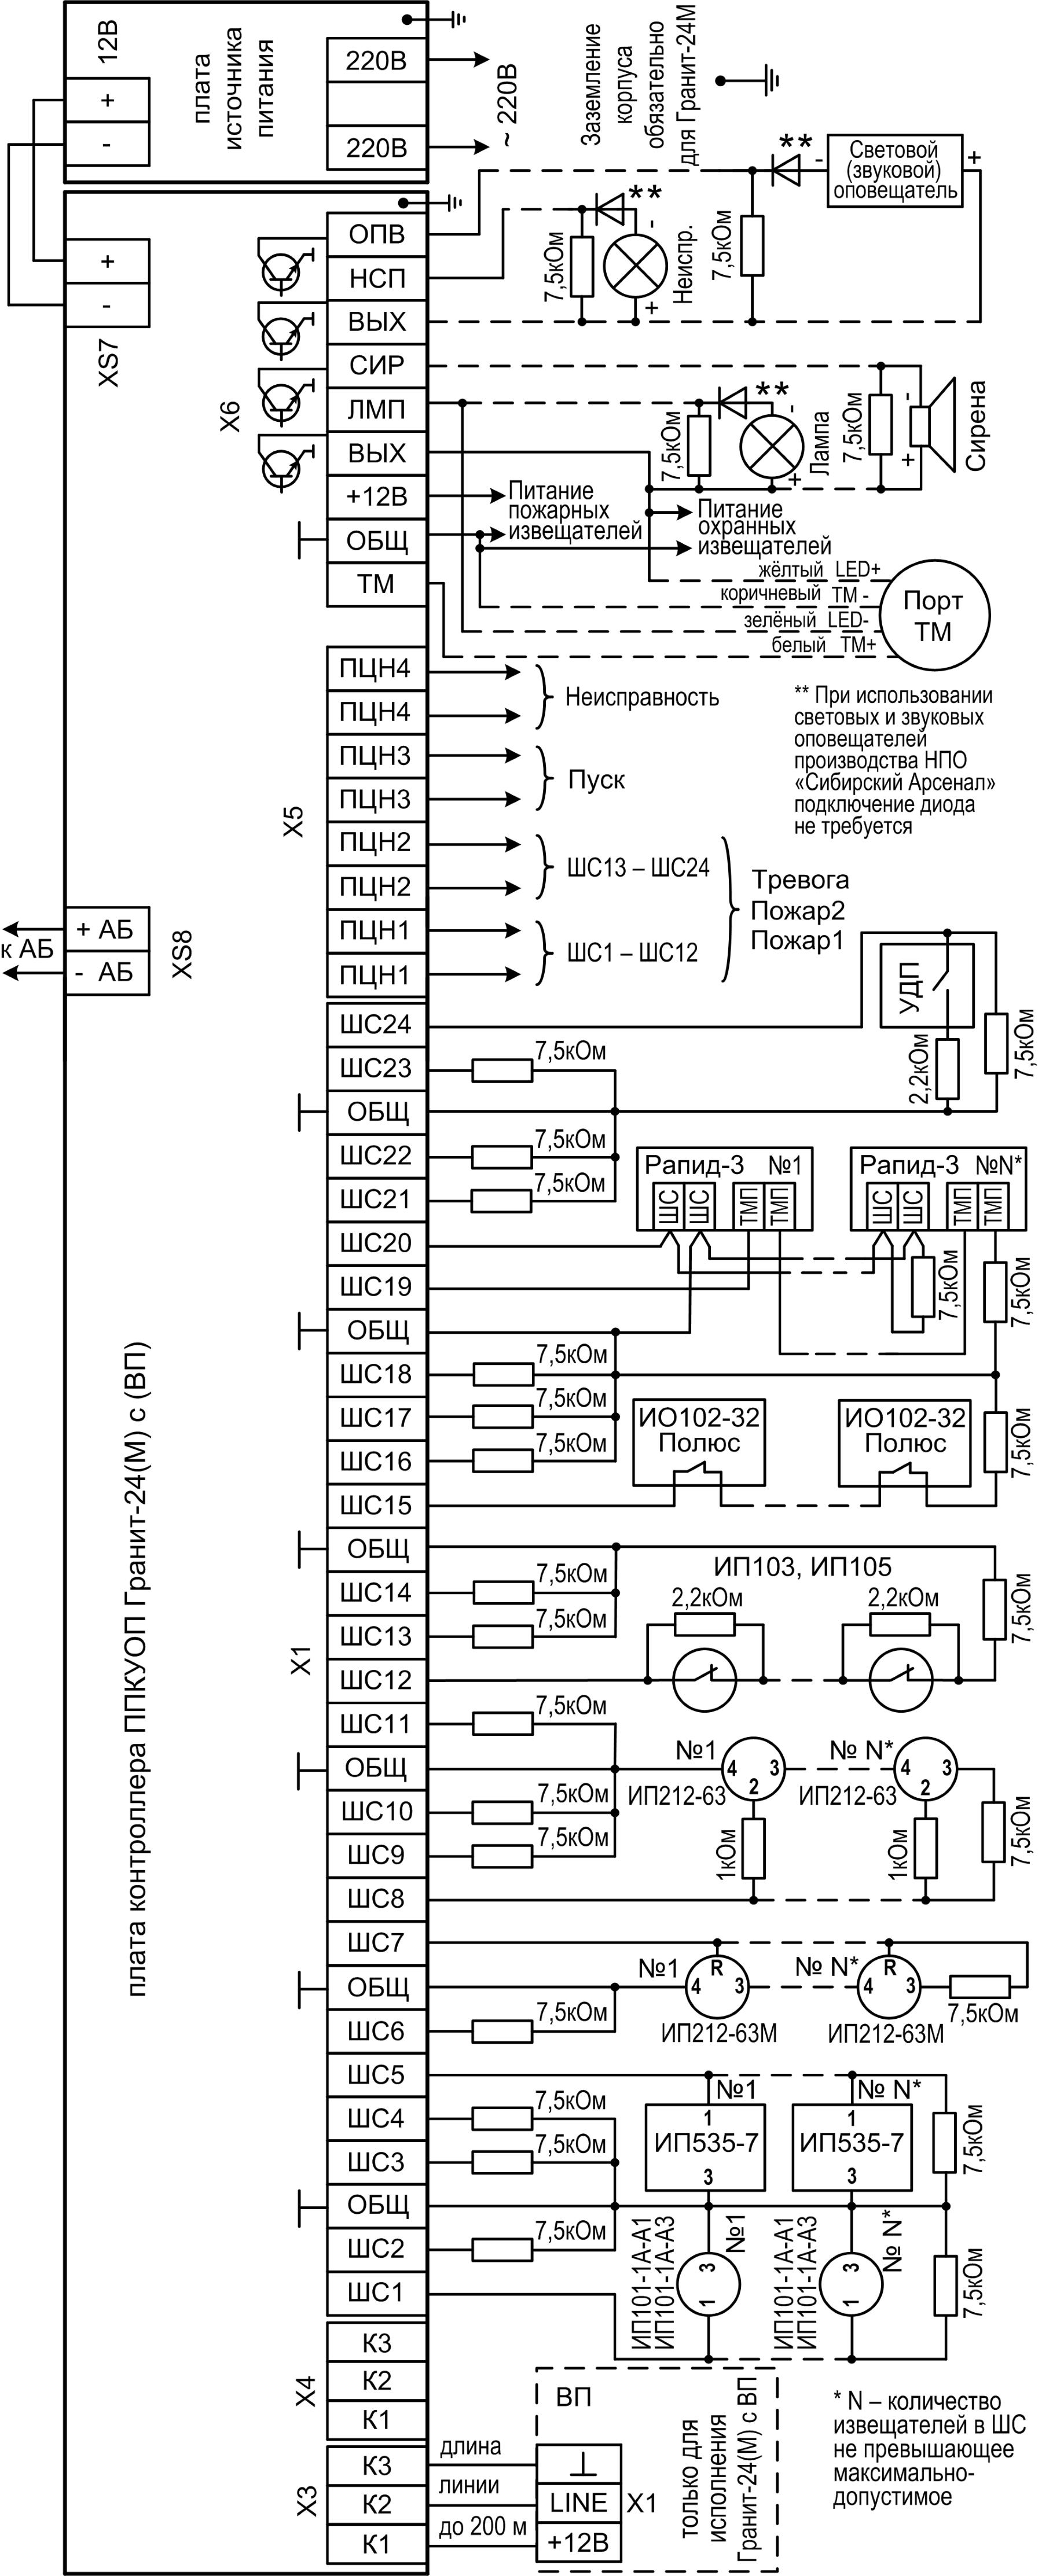 Ип 101 схема подключения к сигнал 20 фото 796